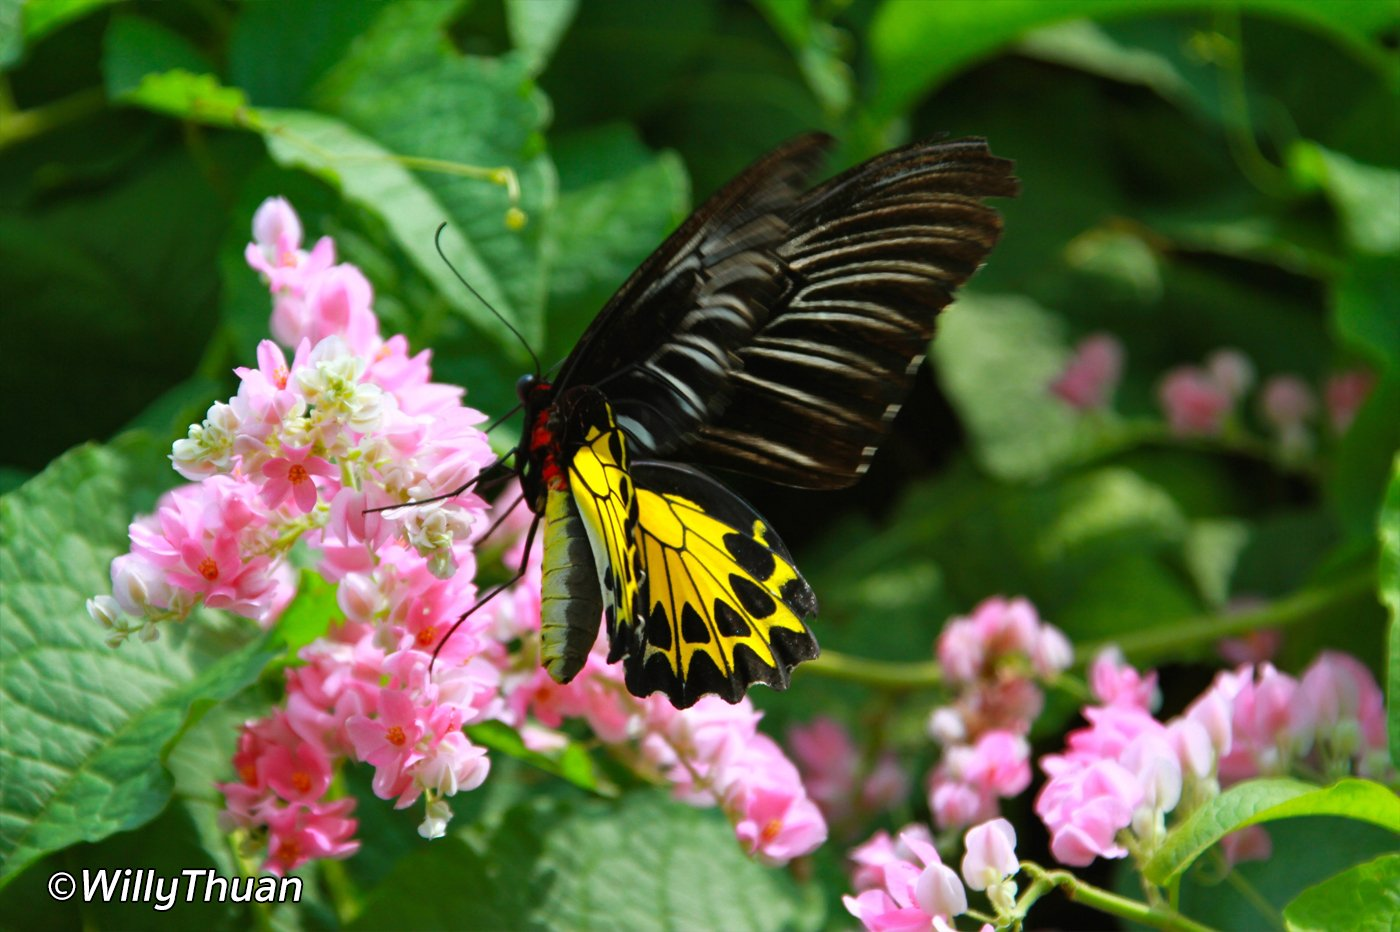 Phuket Butterfly Farm